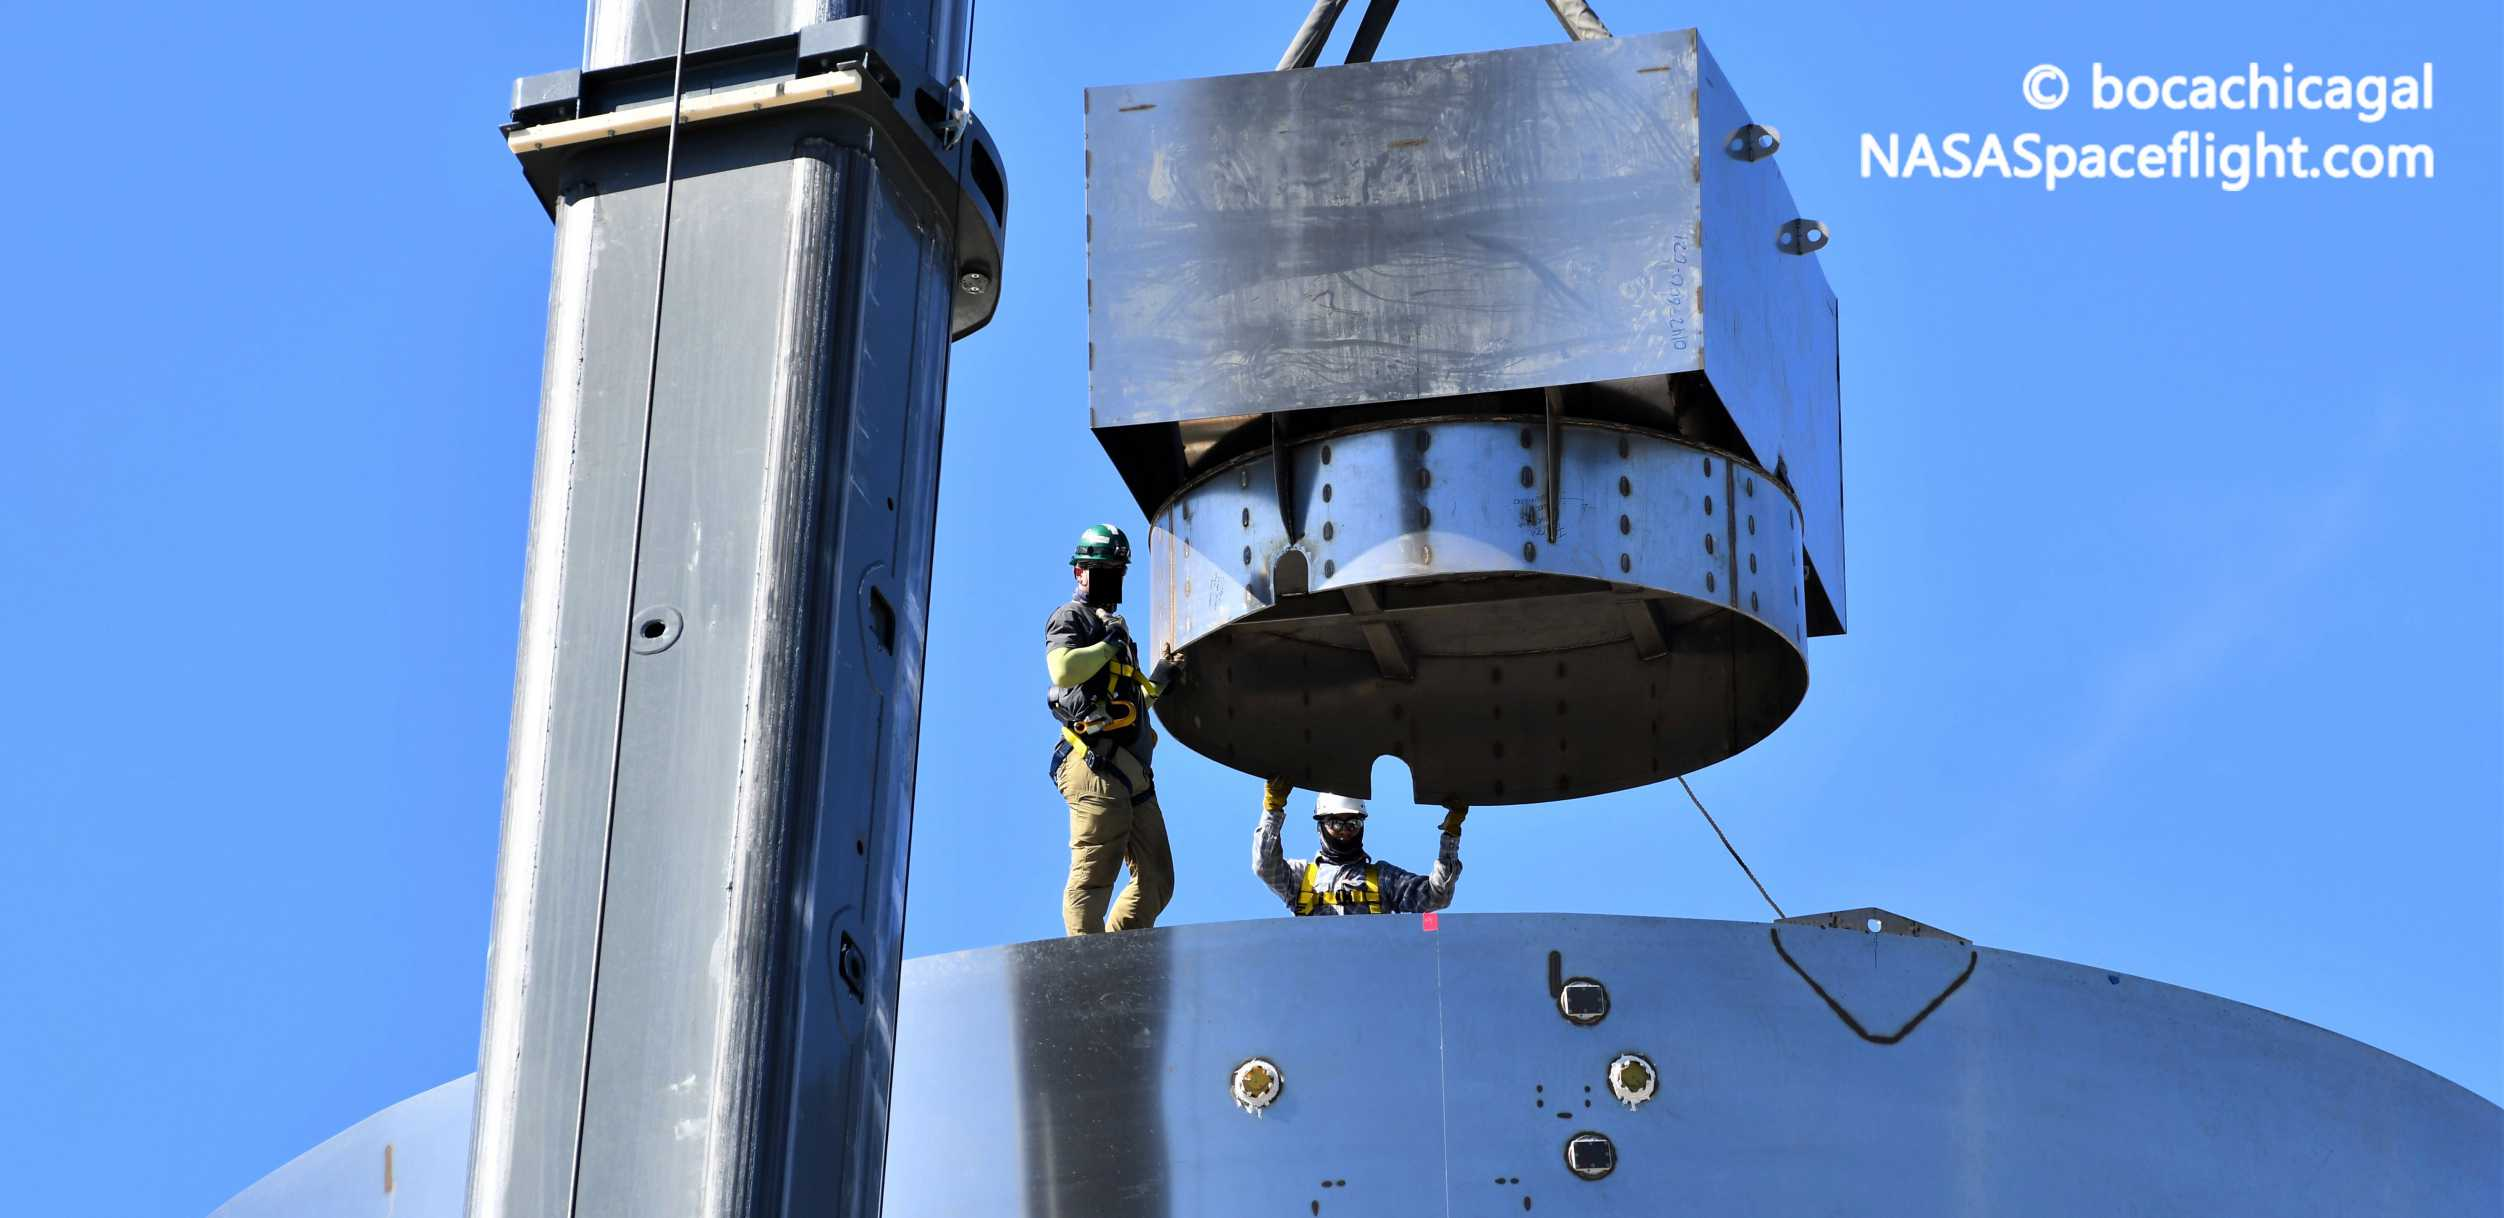 Starship Boca Chica 052720 (NASASpaceflight – bocachicagal) SN4 ballast install 6 crop(c)